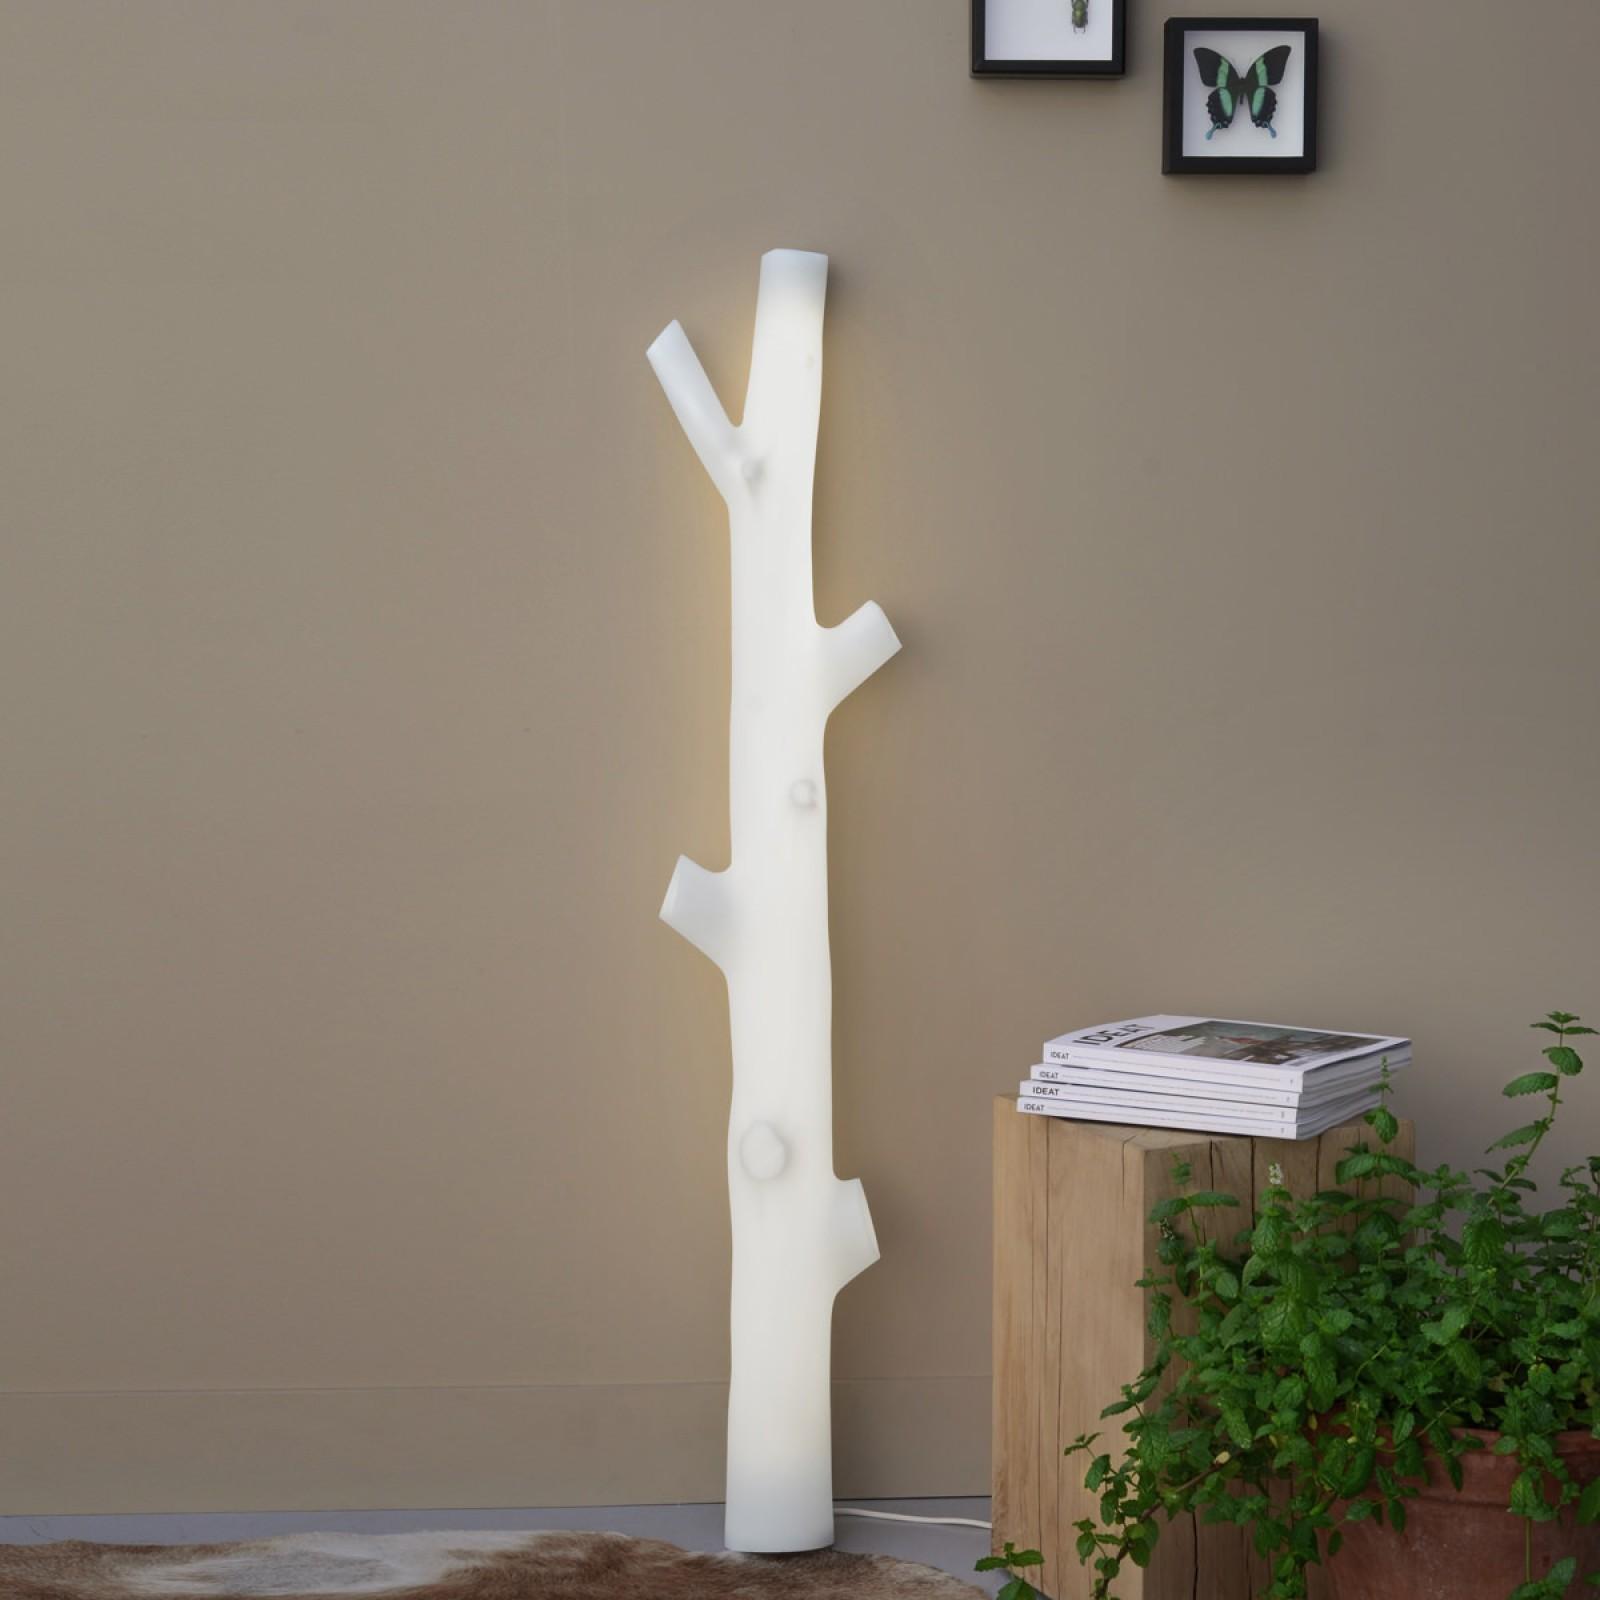 D+I Illuminated Tree Wall & Floor Lamp - Presse Citron